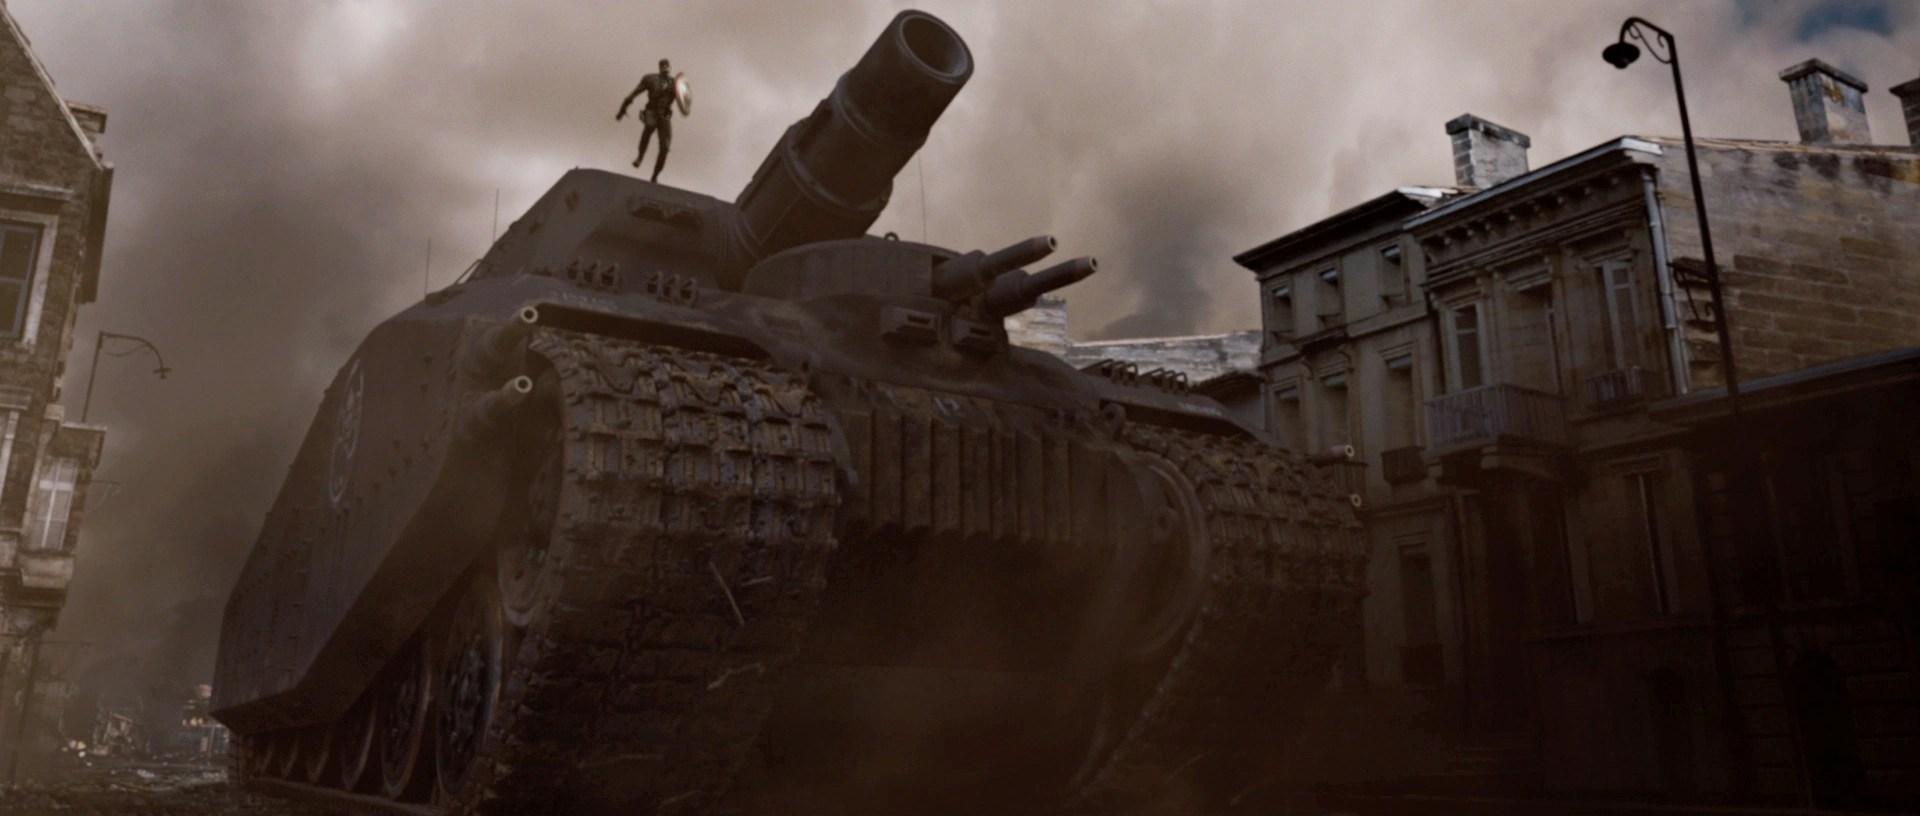 HYDRA Uber Tank Marvel Cinematic Universe Wiki FANDOM Powered By Wikia